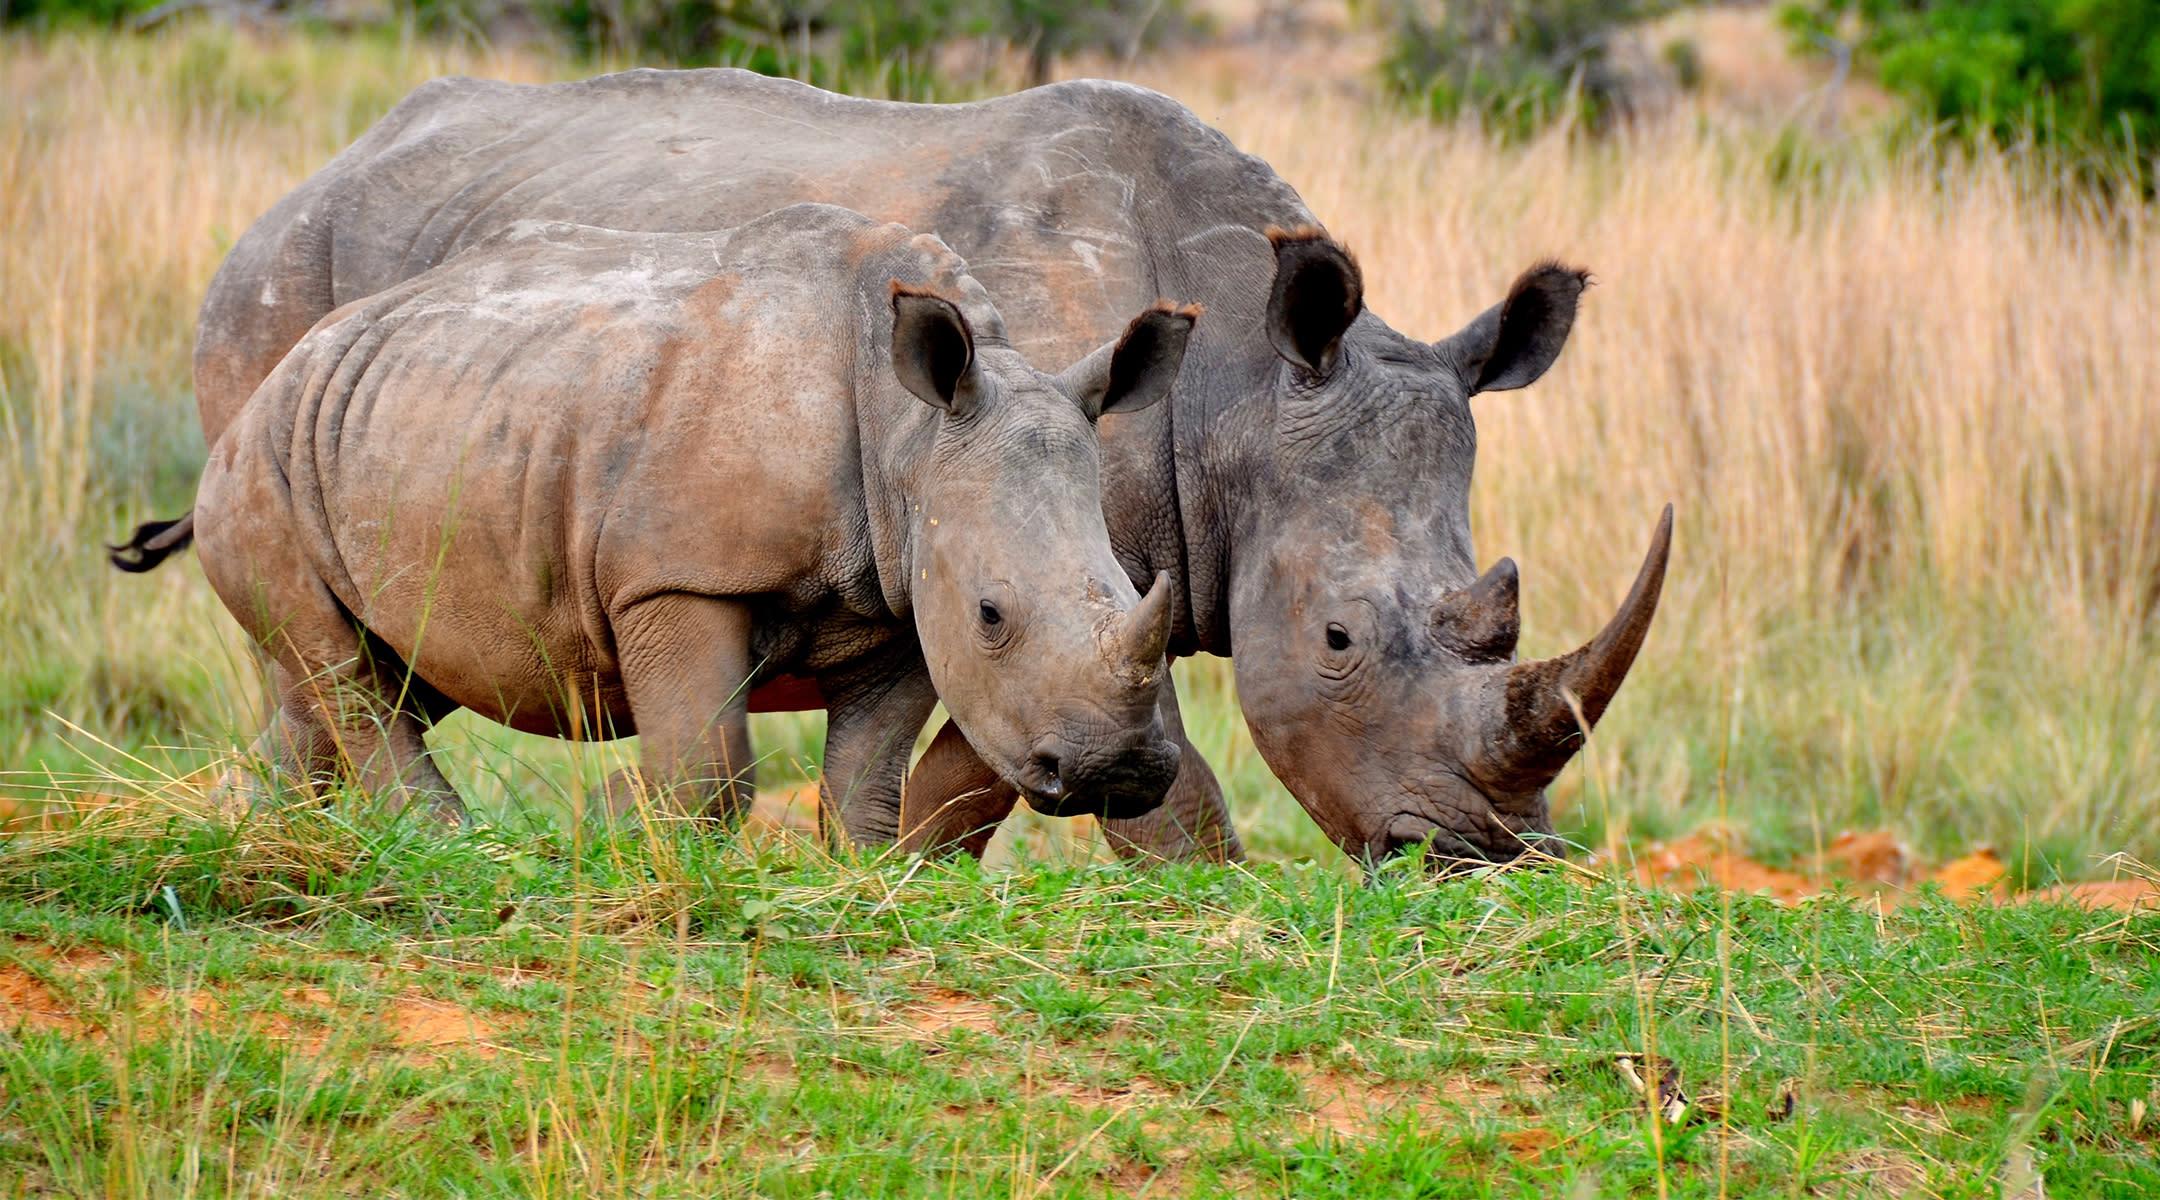 rhino with smaller rhino walking outdoors